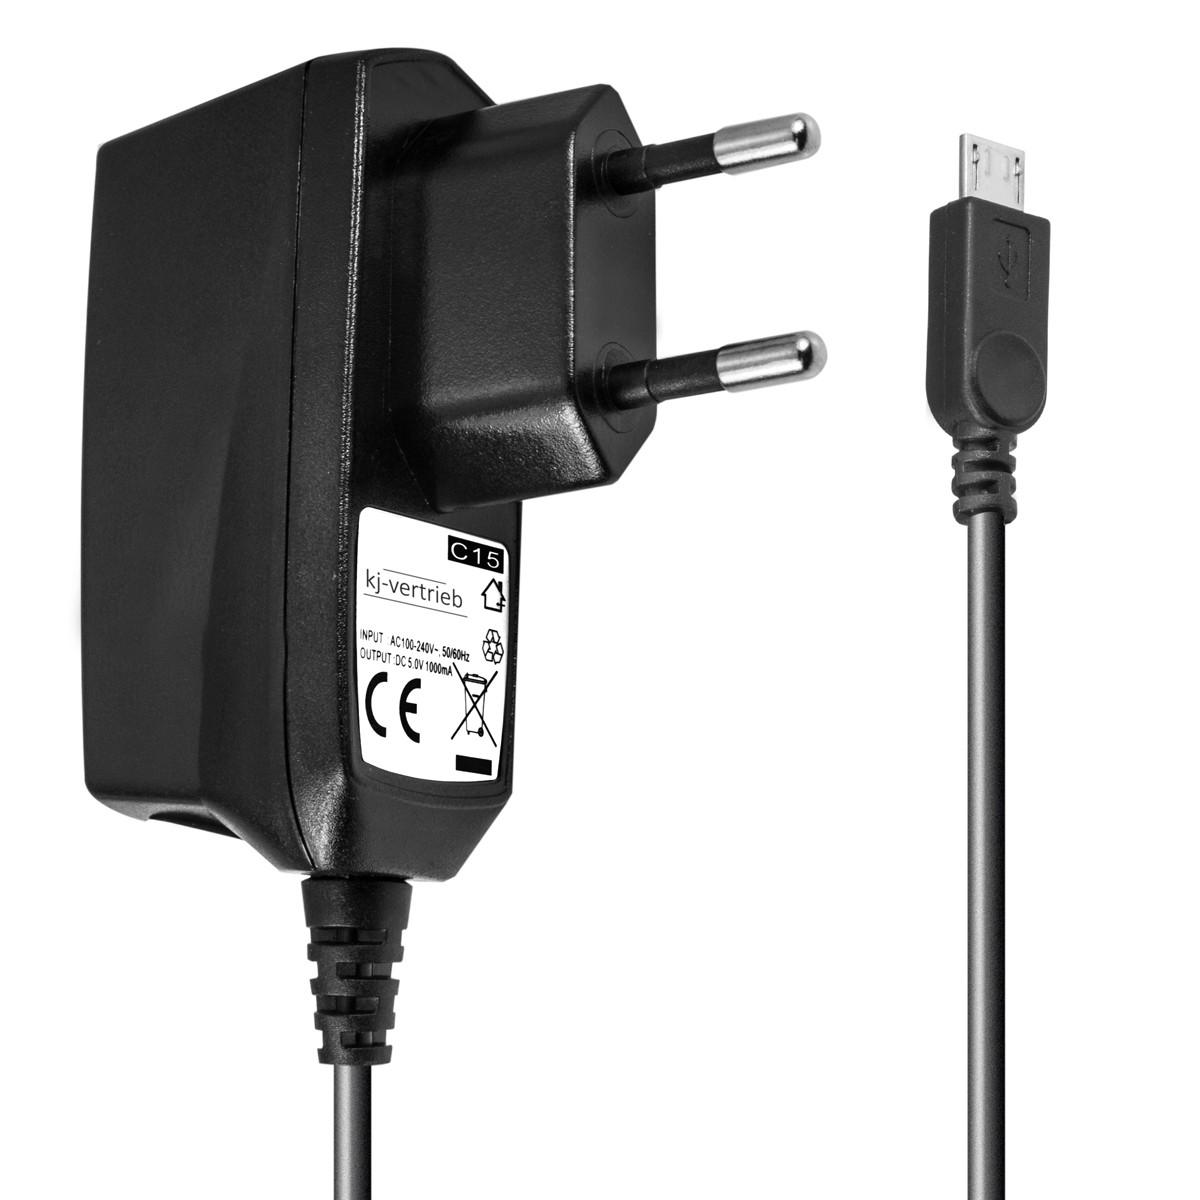 Ladegerät für Nokia, Blackberry, Motorola, Samsung, Sony Ericsson, Blackberry, HTC - micro USB Output 1A